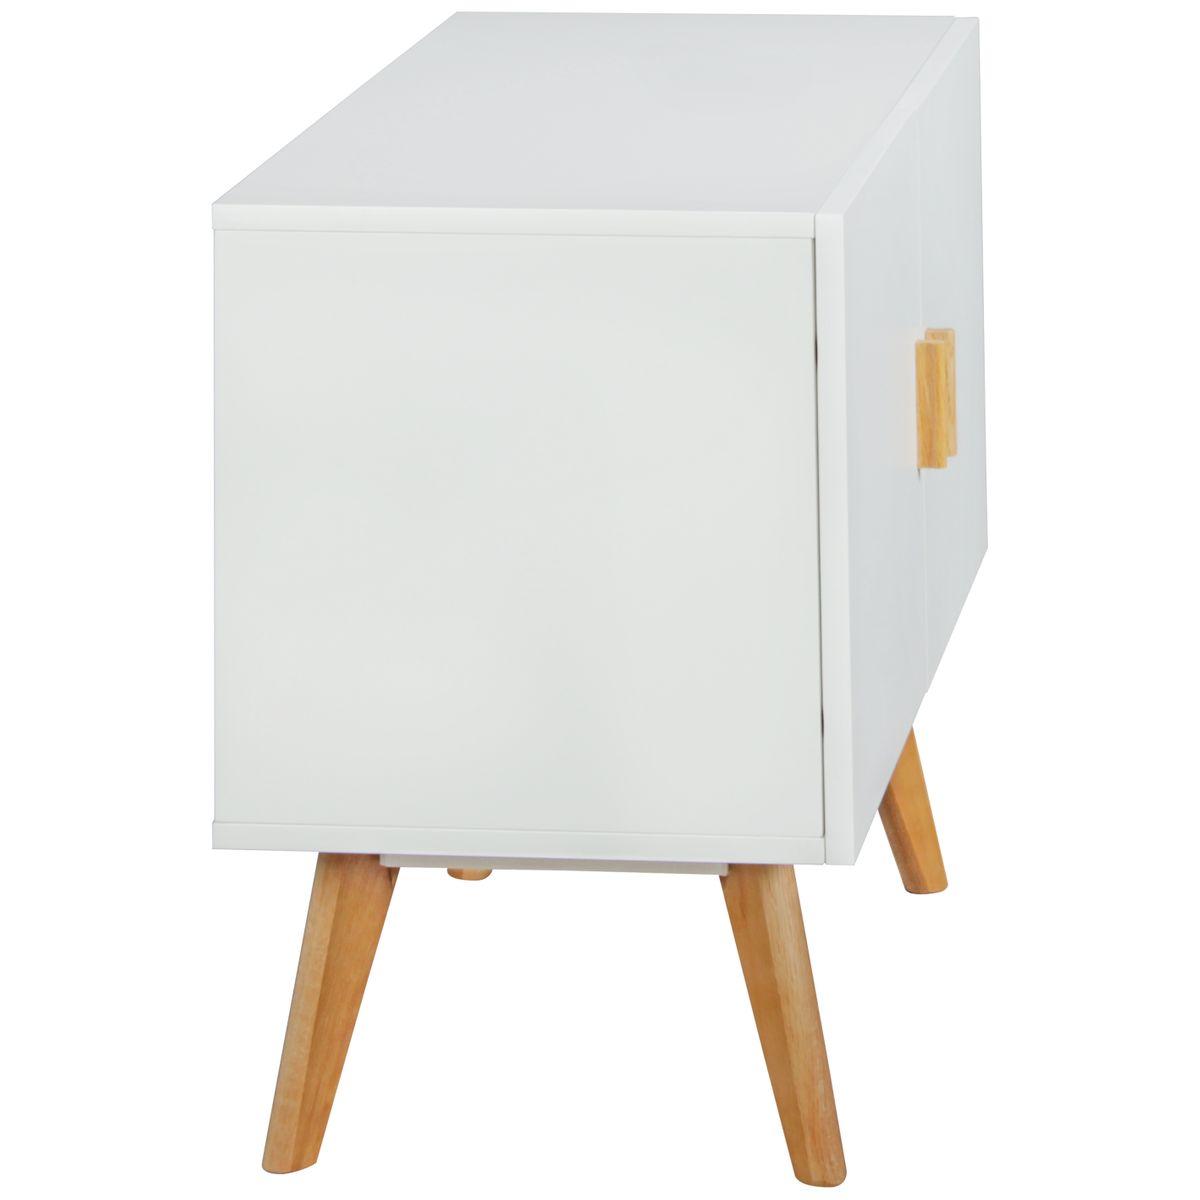 Sideboard mdf scanio anrichte 90x40 cm flur kommode for Kommode 90 x 40